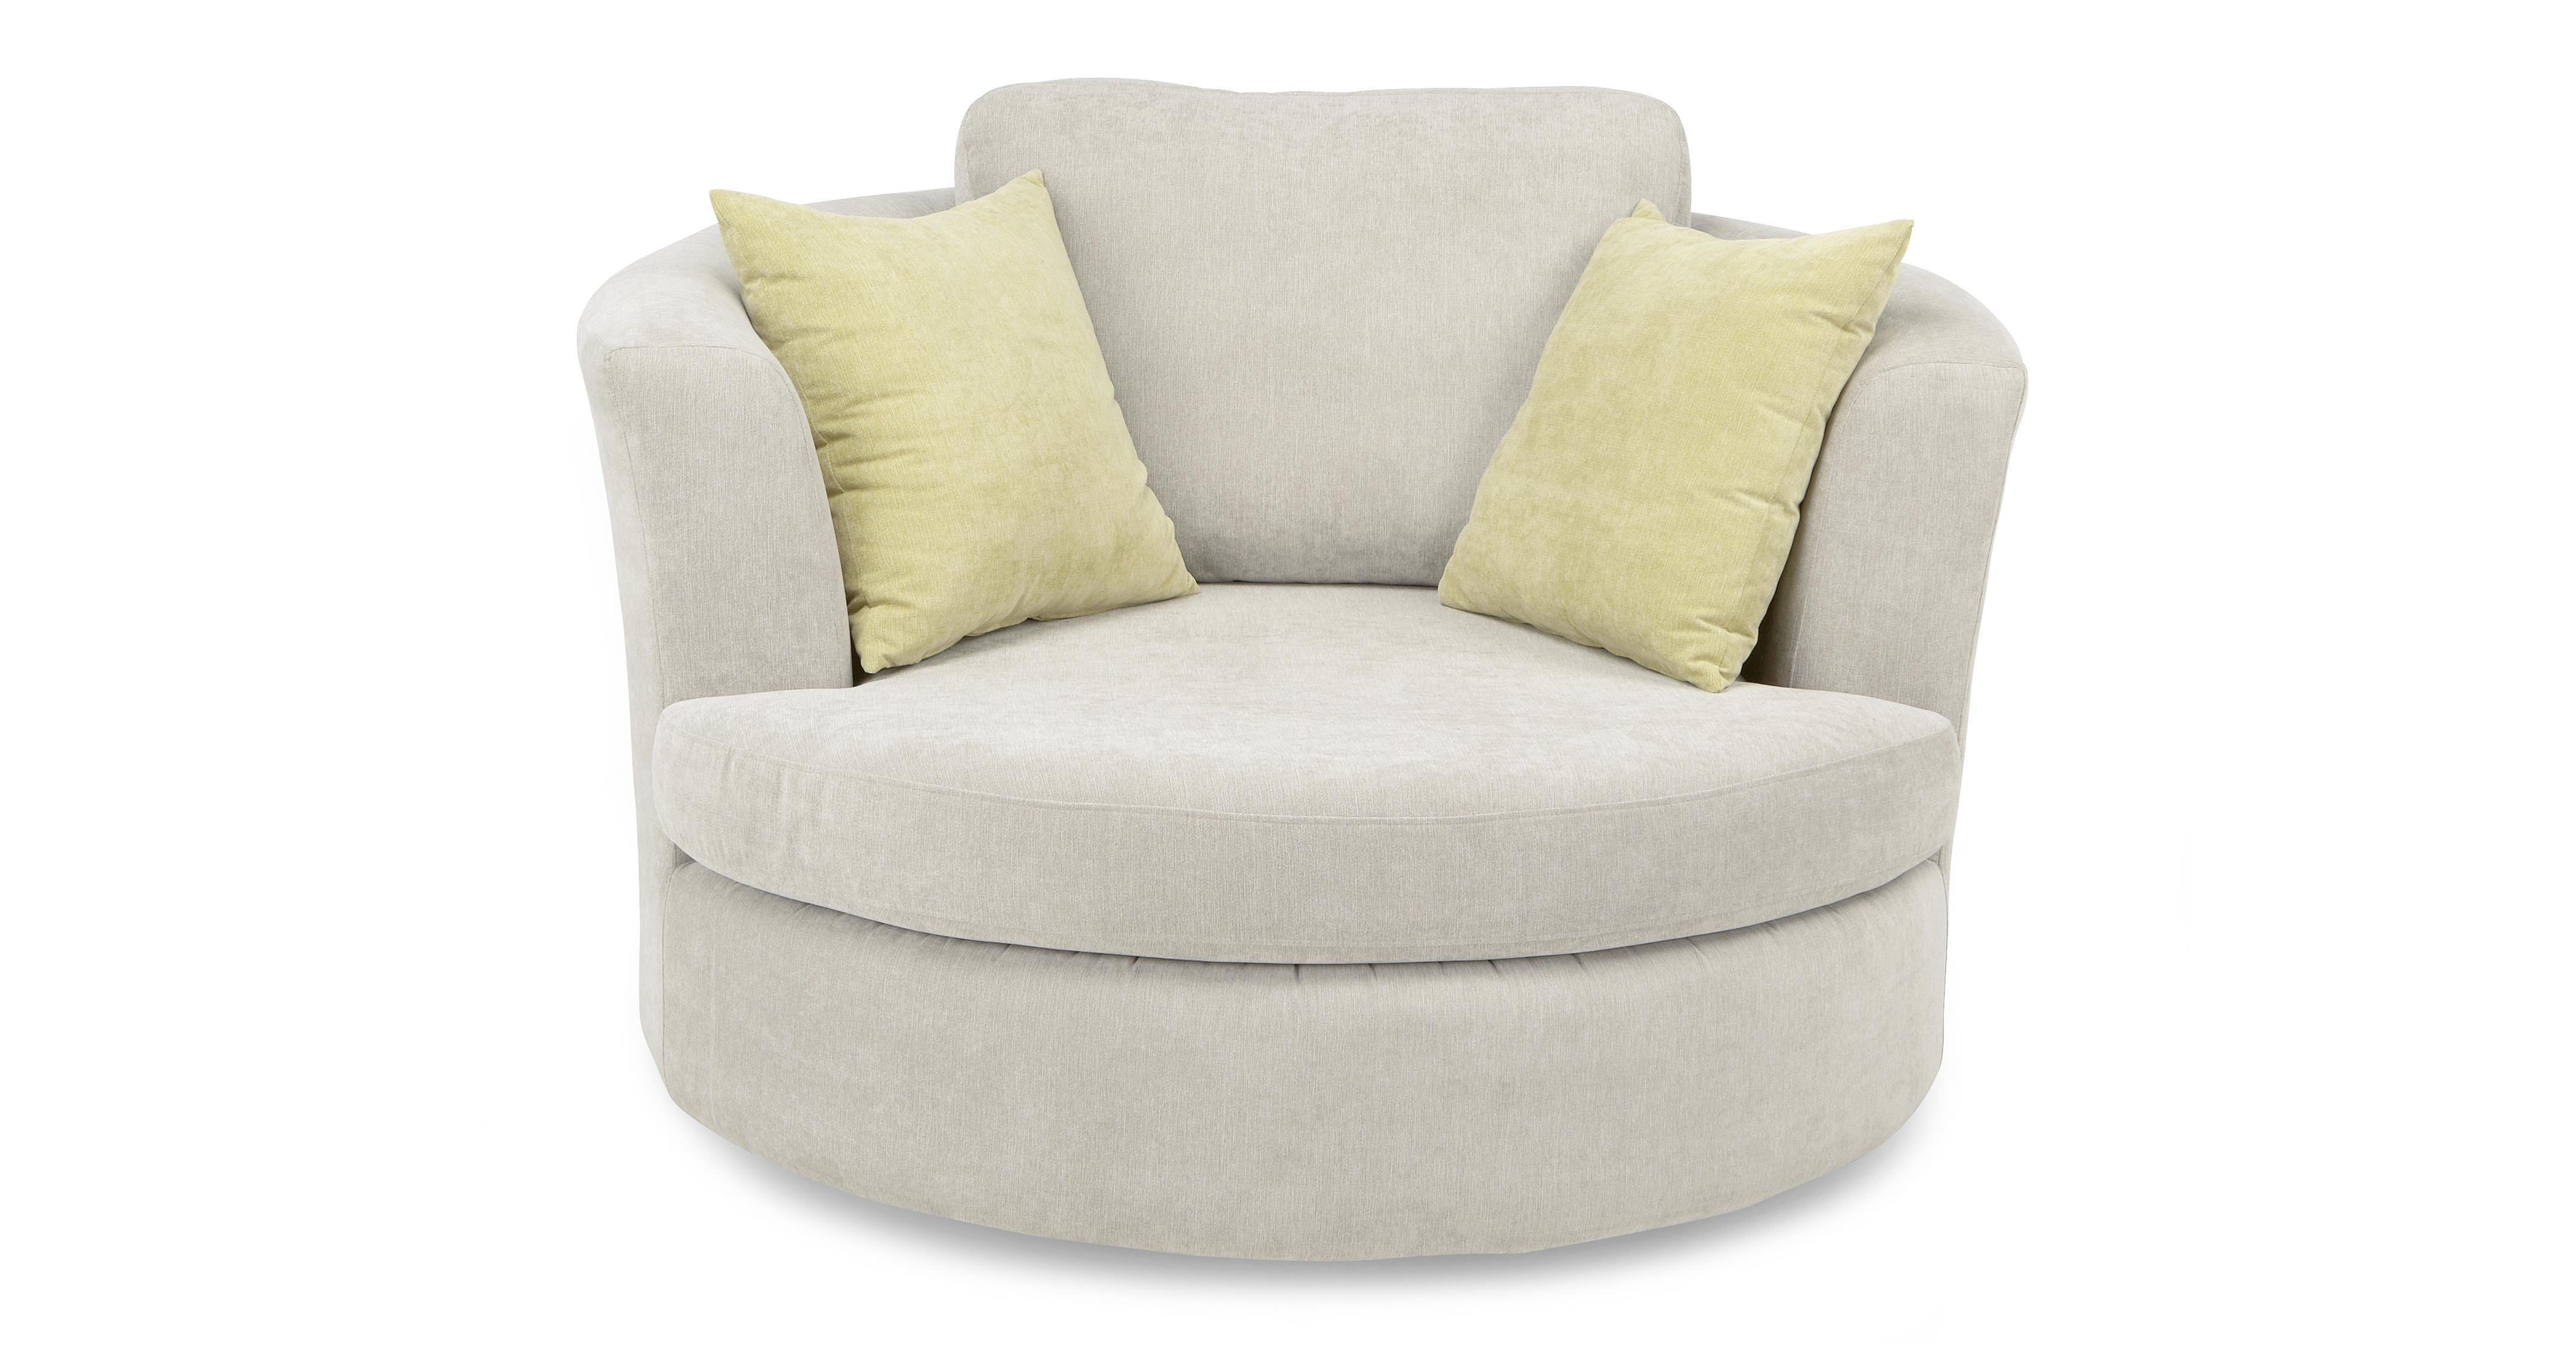 swivel chair ireland zero g freya large dfs